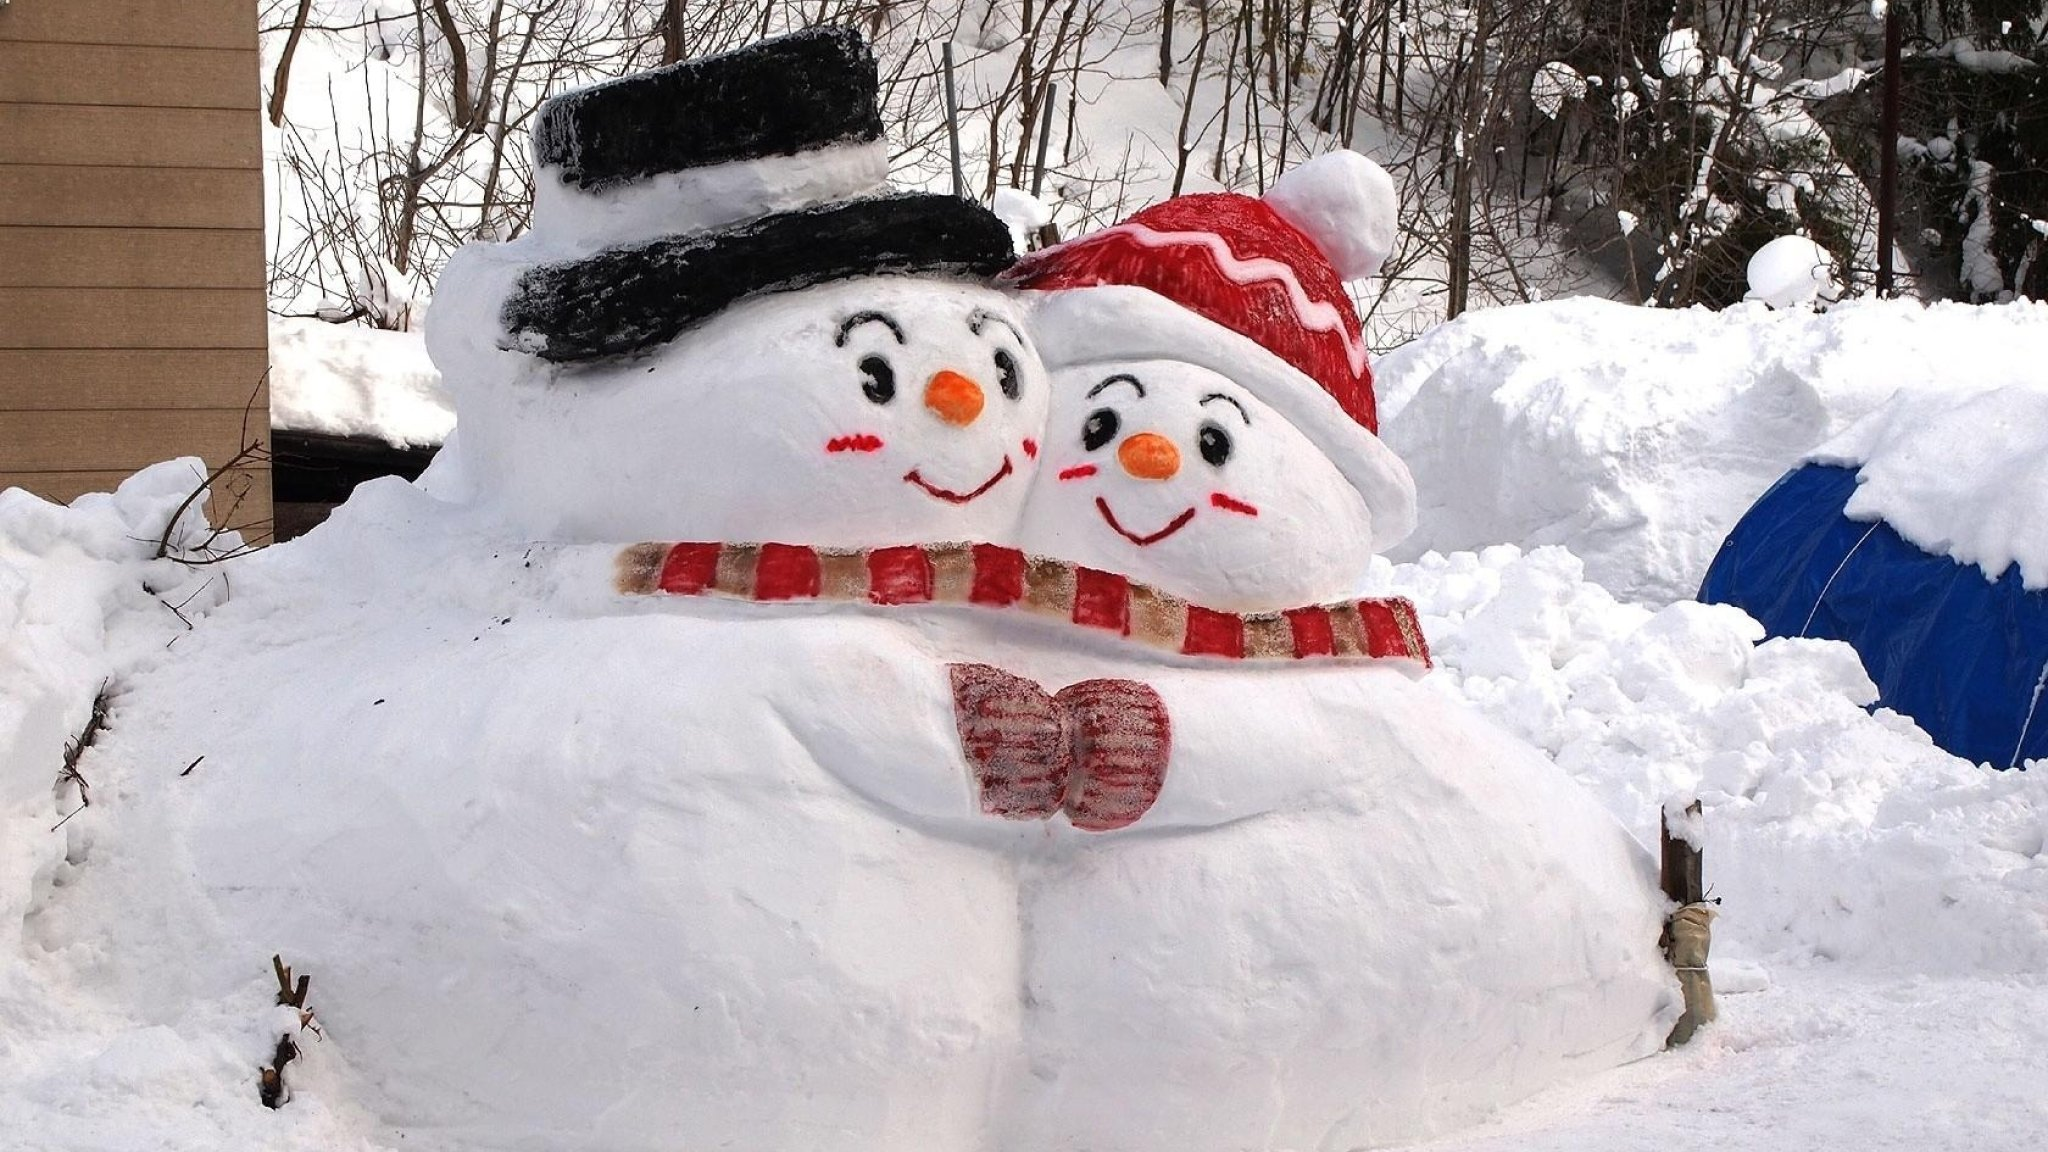 download 2048x1152 snowmen snow winter 2048x1152 Resolution 2048x1152